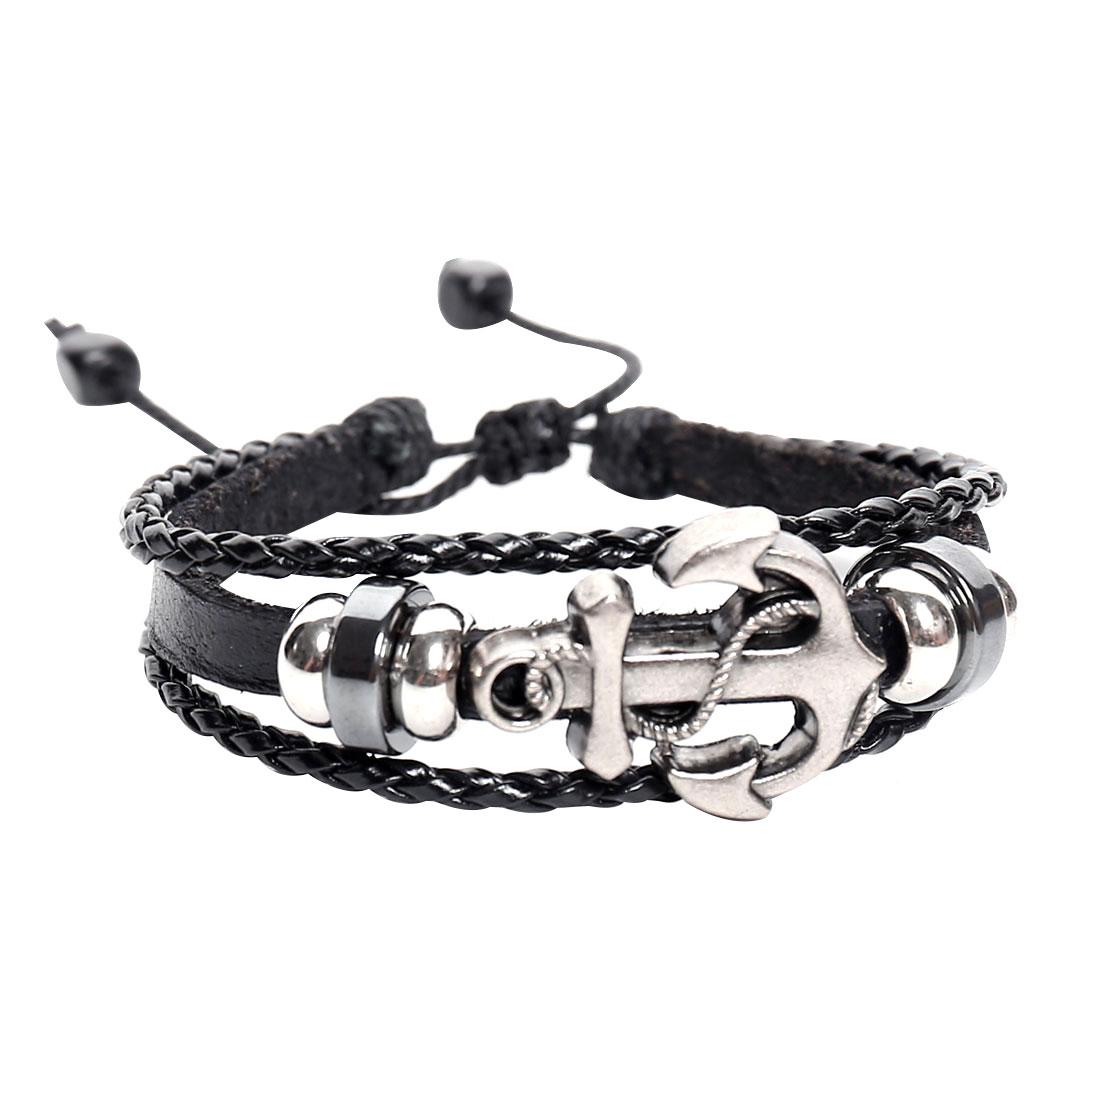 Punk Anchor Leather Charm Wrap Wristband Bracelet Bangle Cuff